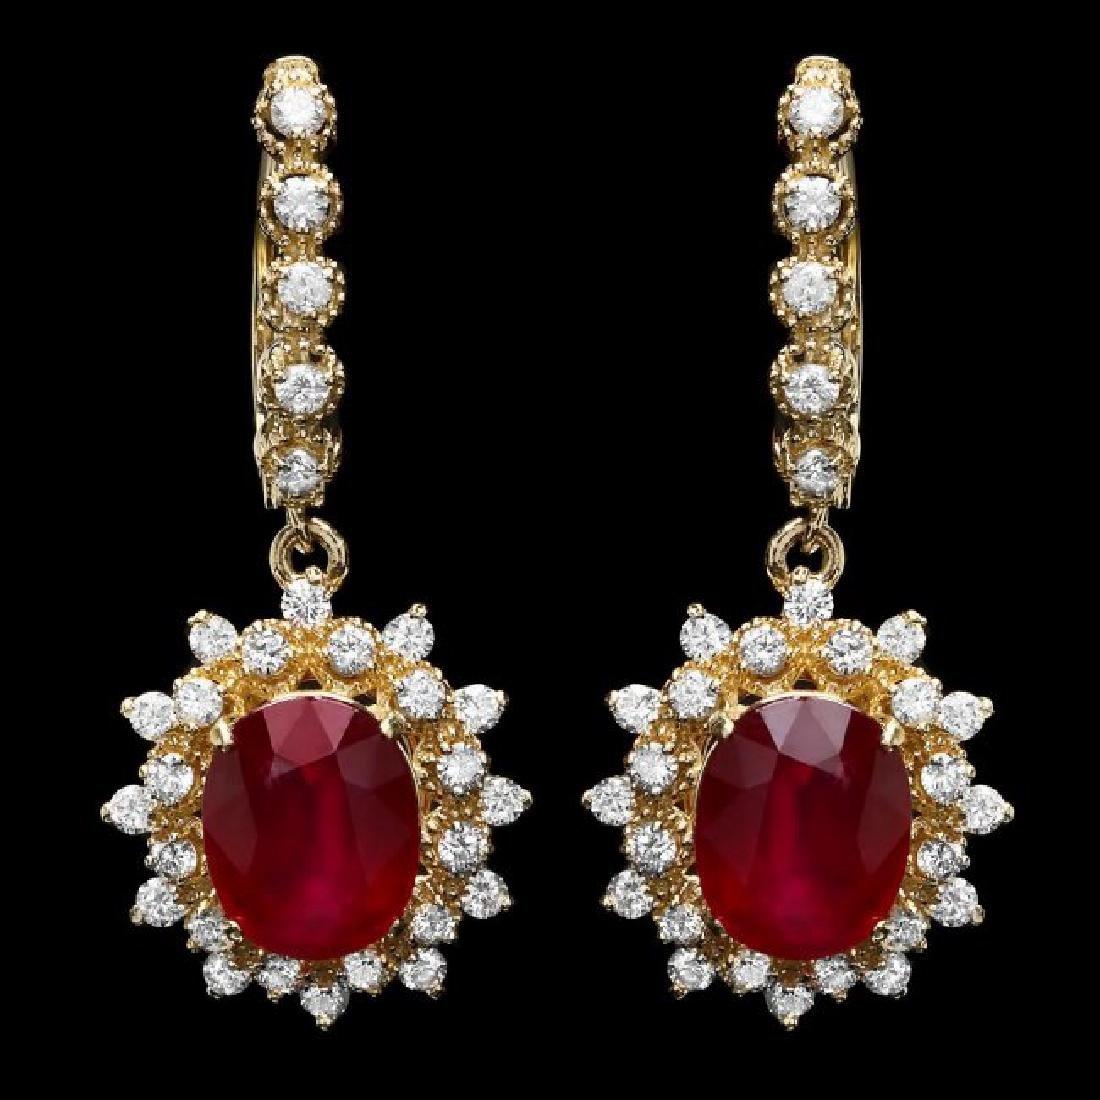 14k Gold 8.00ct Ruby 1.60ct Diamond Earrings - 2